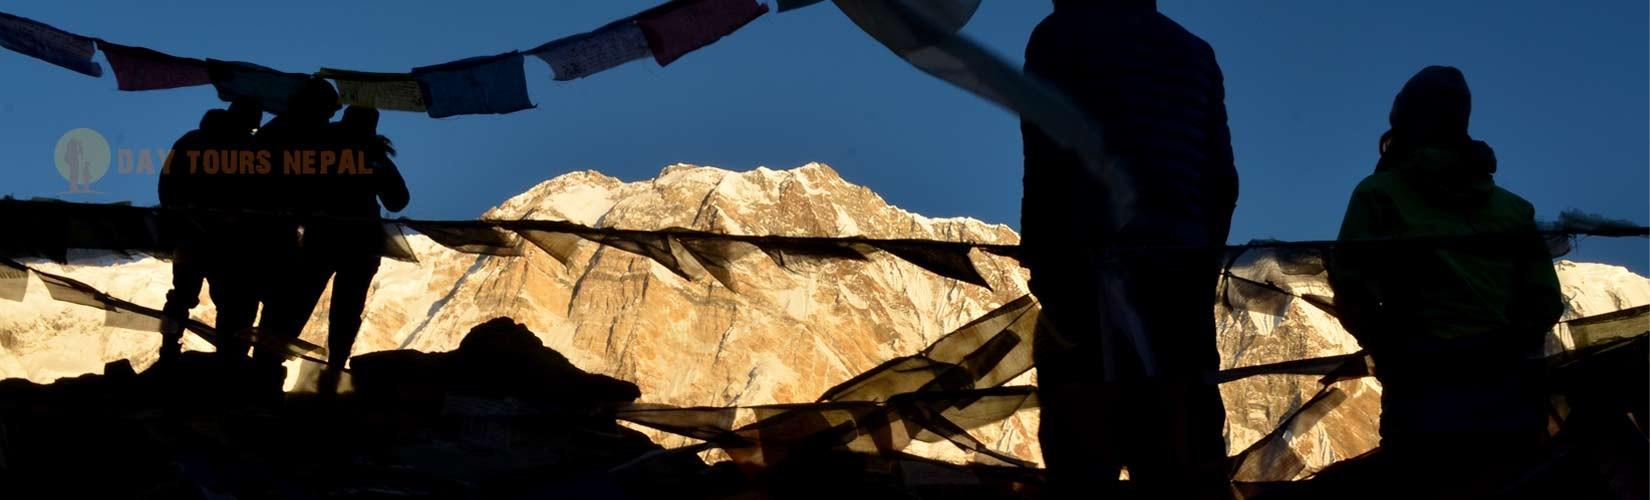 Trekking Au Nepal Day Tours Nepal